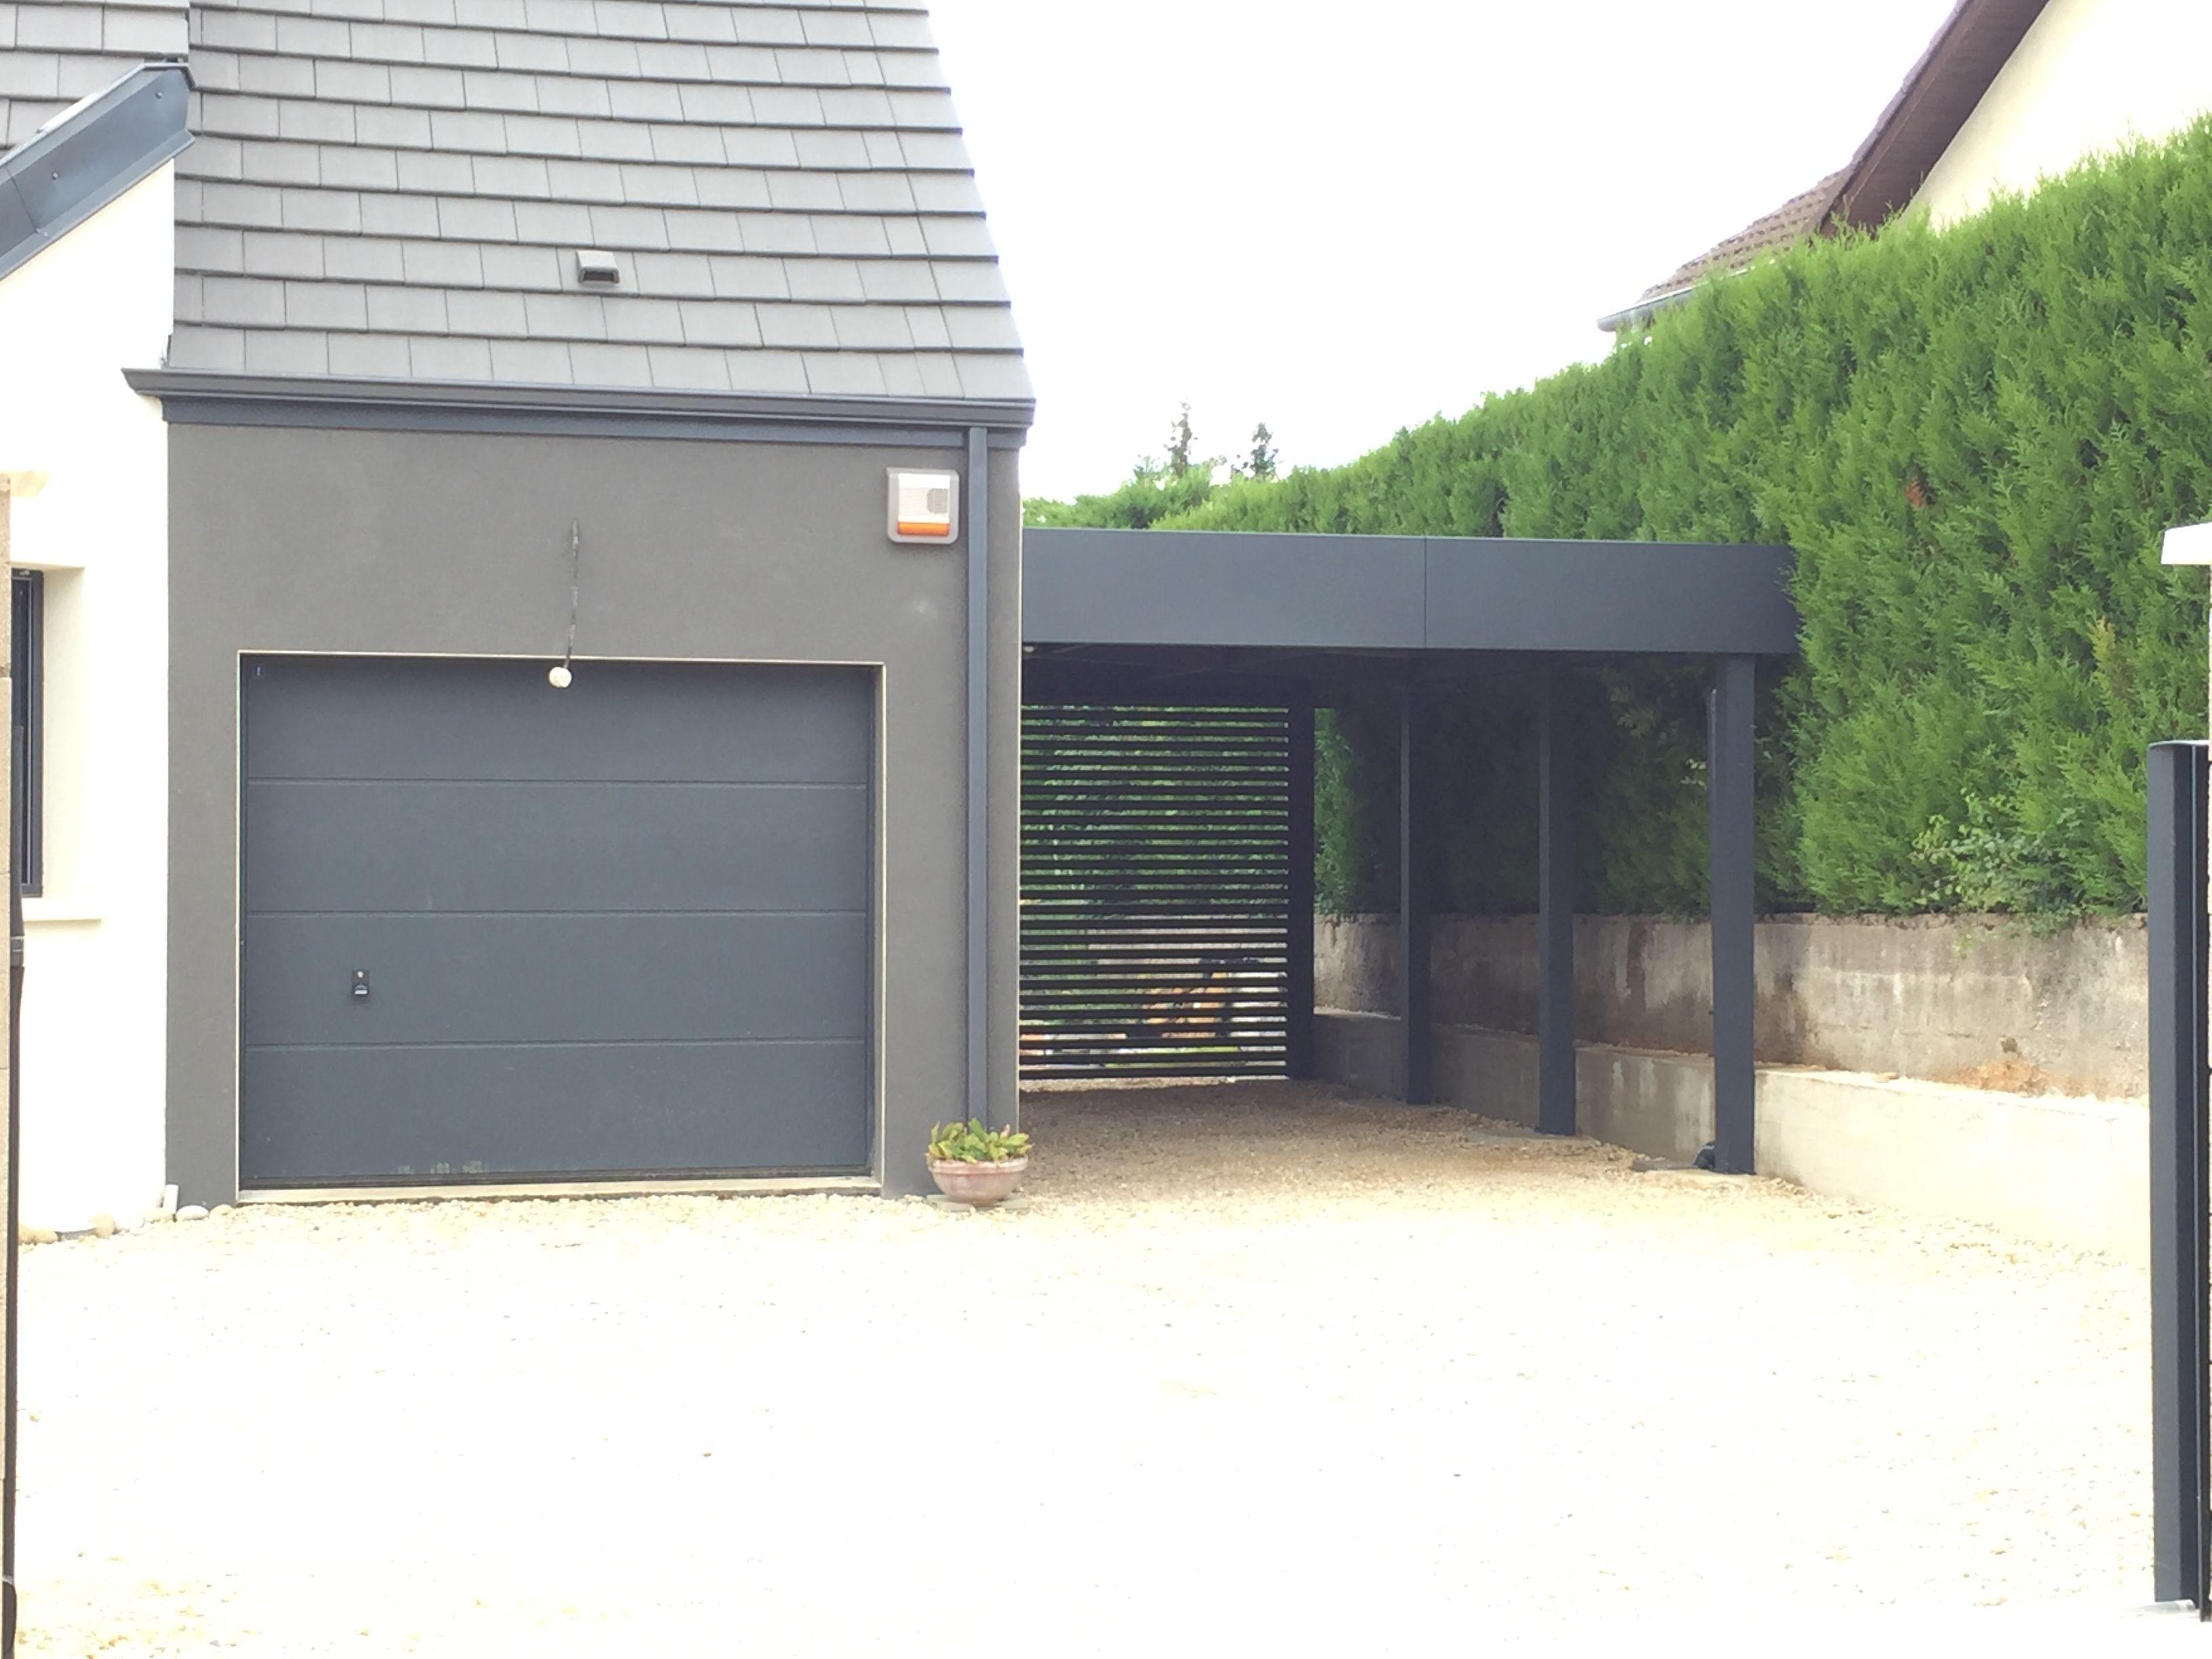 Carport alu dijon nord pas de calais france fabricant 6 bonne pinterest carport alu - Garage bmw nord pas de calais ...